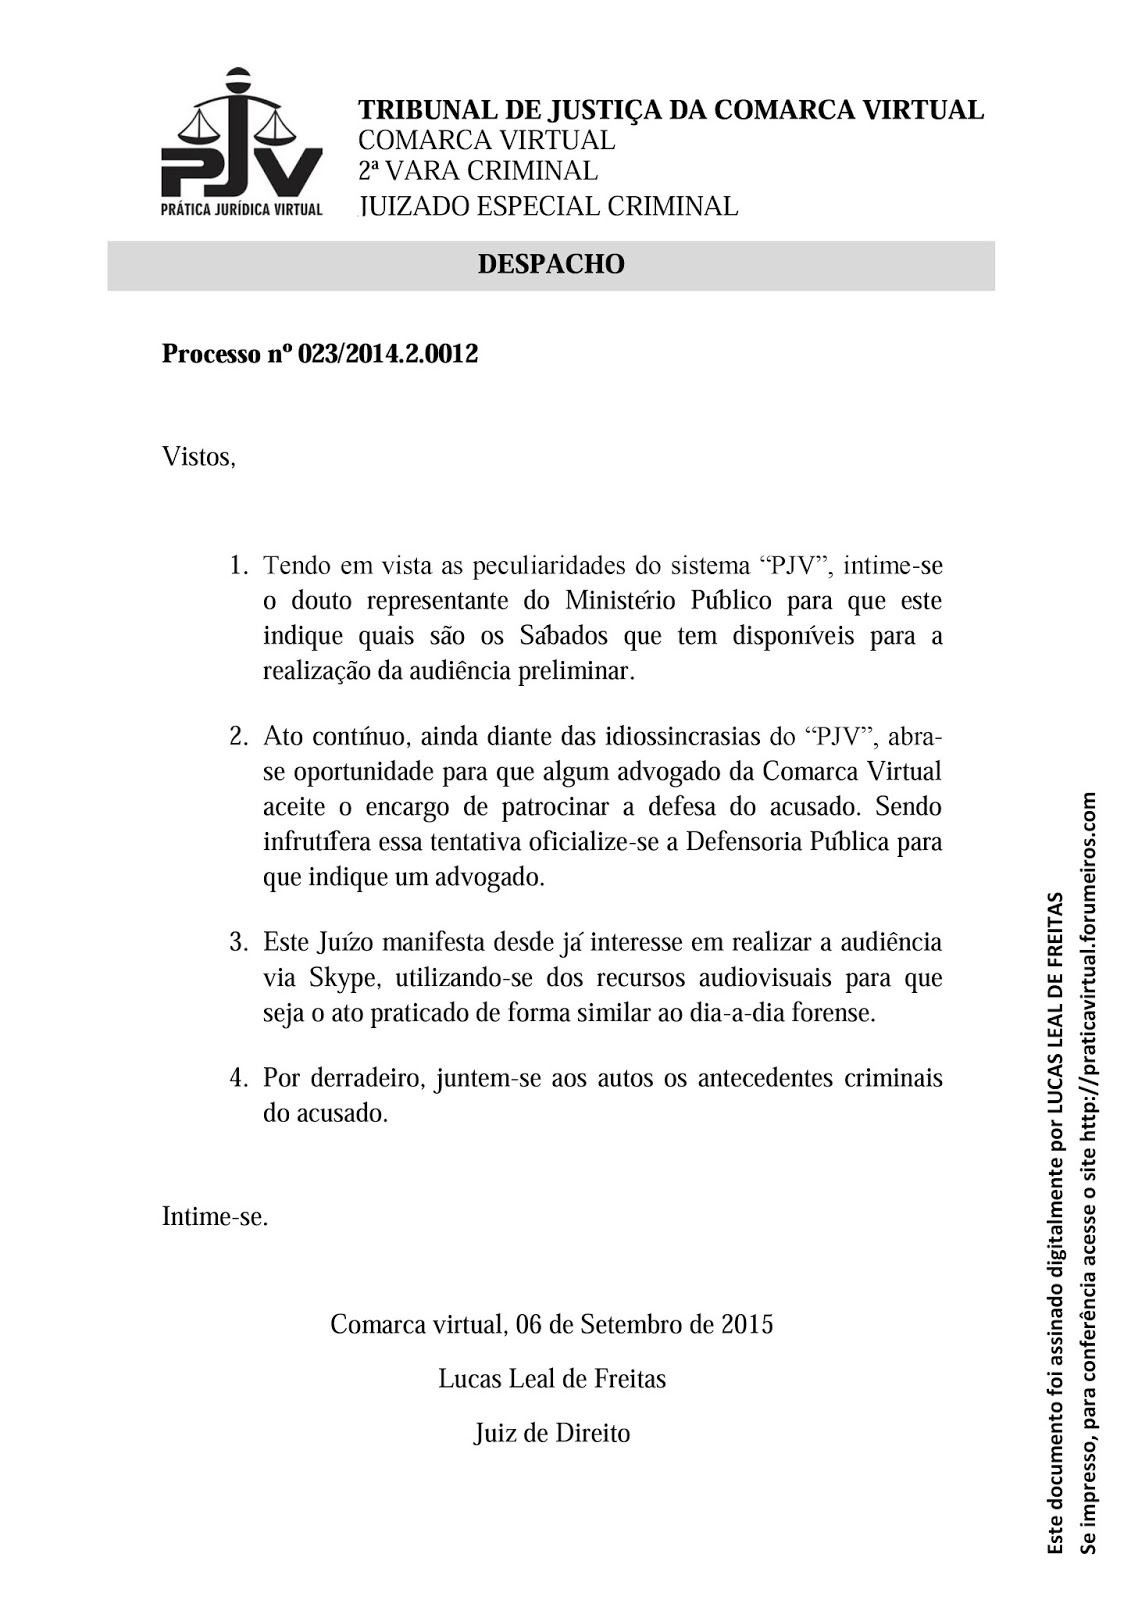 Processo n° 023/2014.2.0012 Image-0001%2B%25282%2529